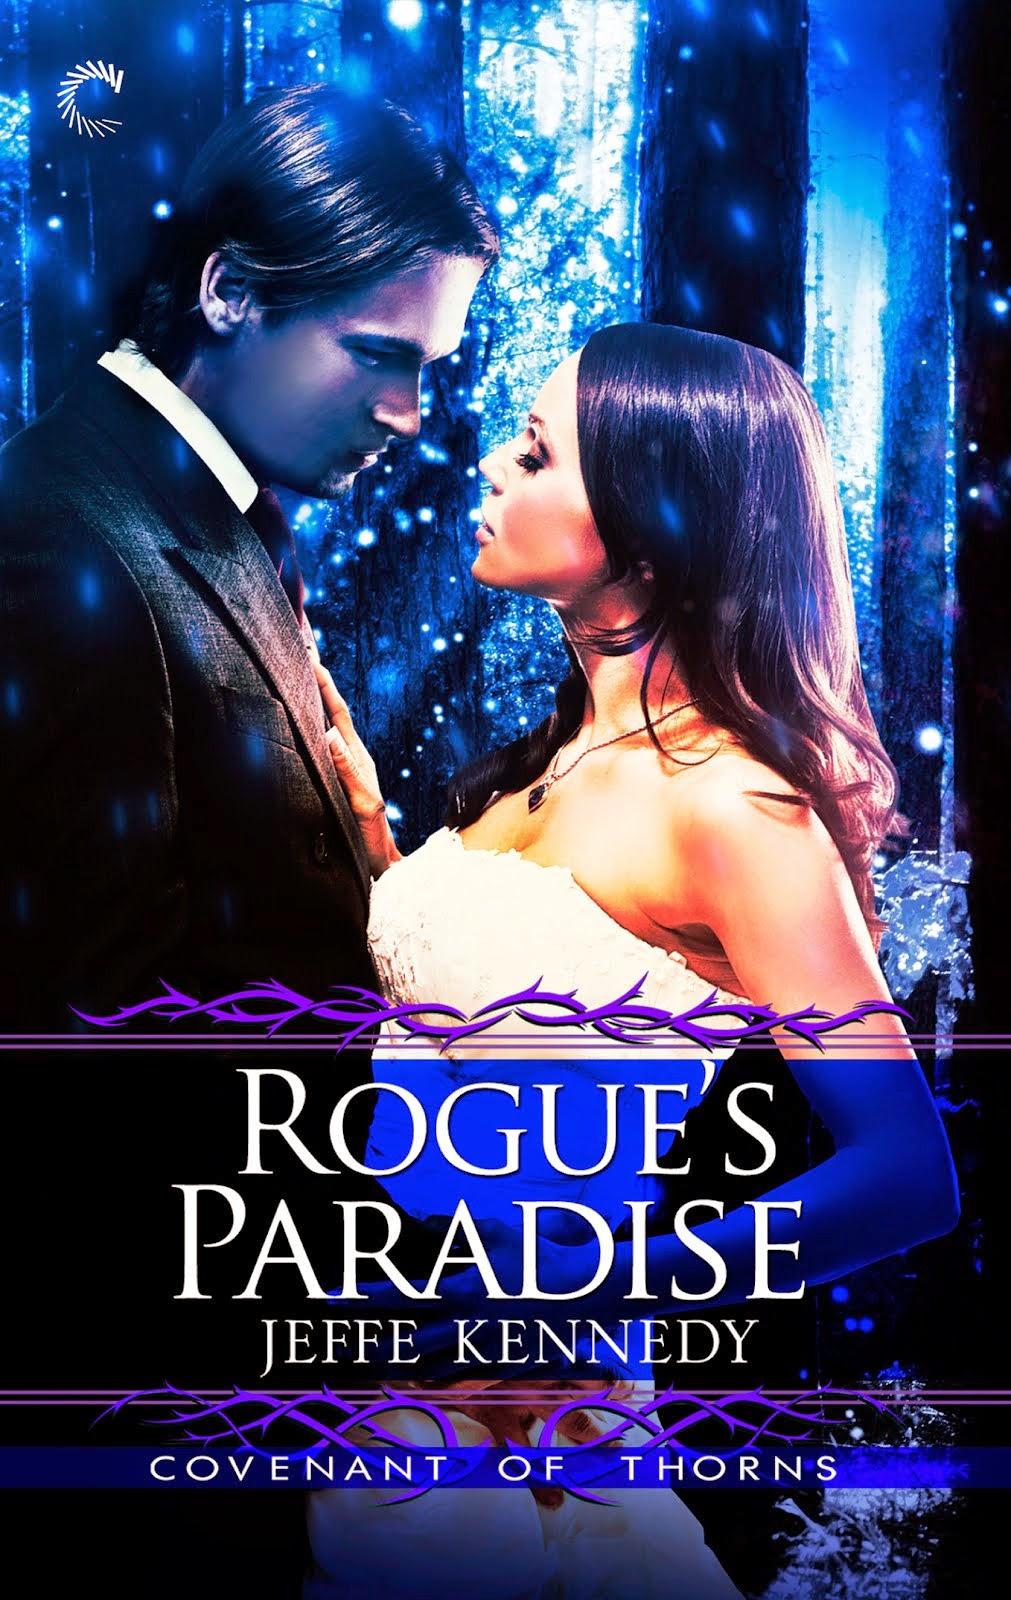 Rogue's Paradise